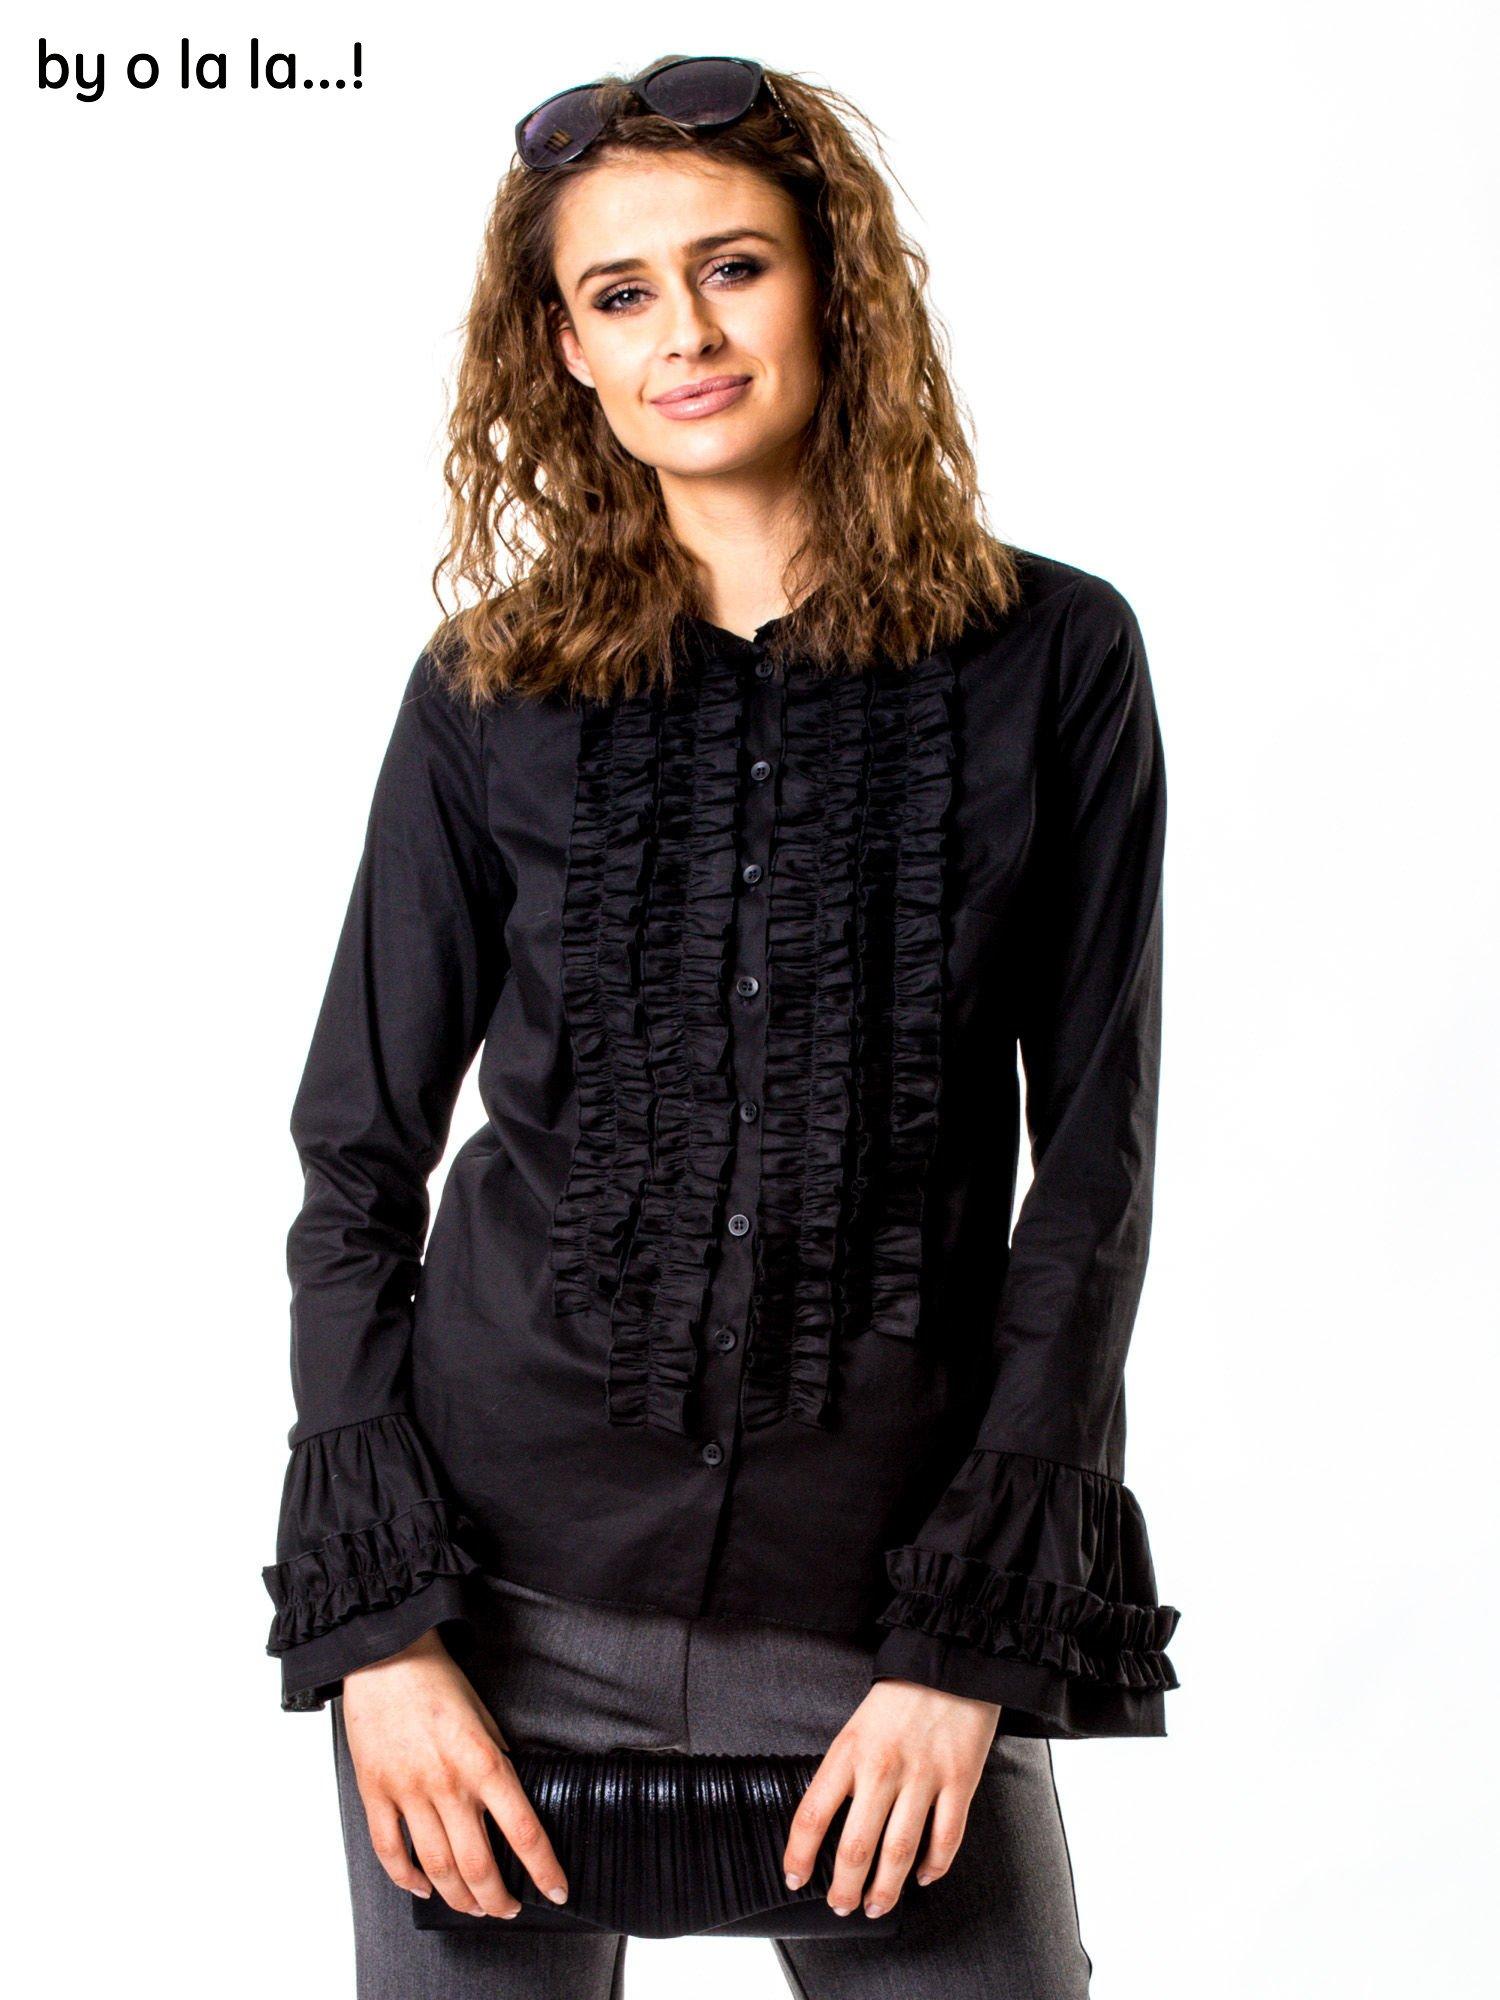 e3fdd0563d22fa Czarna koszula z żabotem BY O LA LA - Koszula klasyczna - sklep eButik.pl